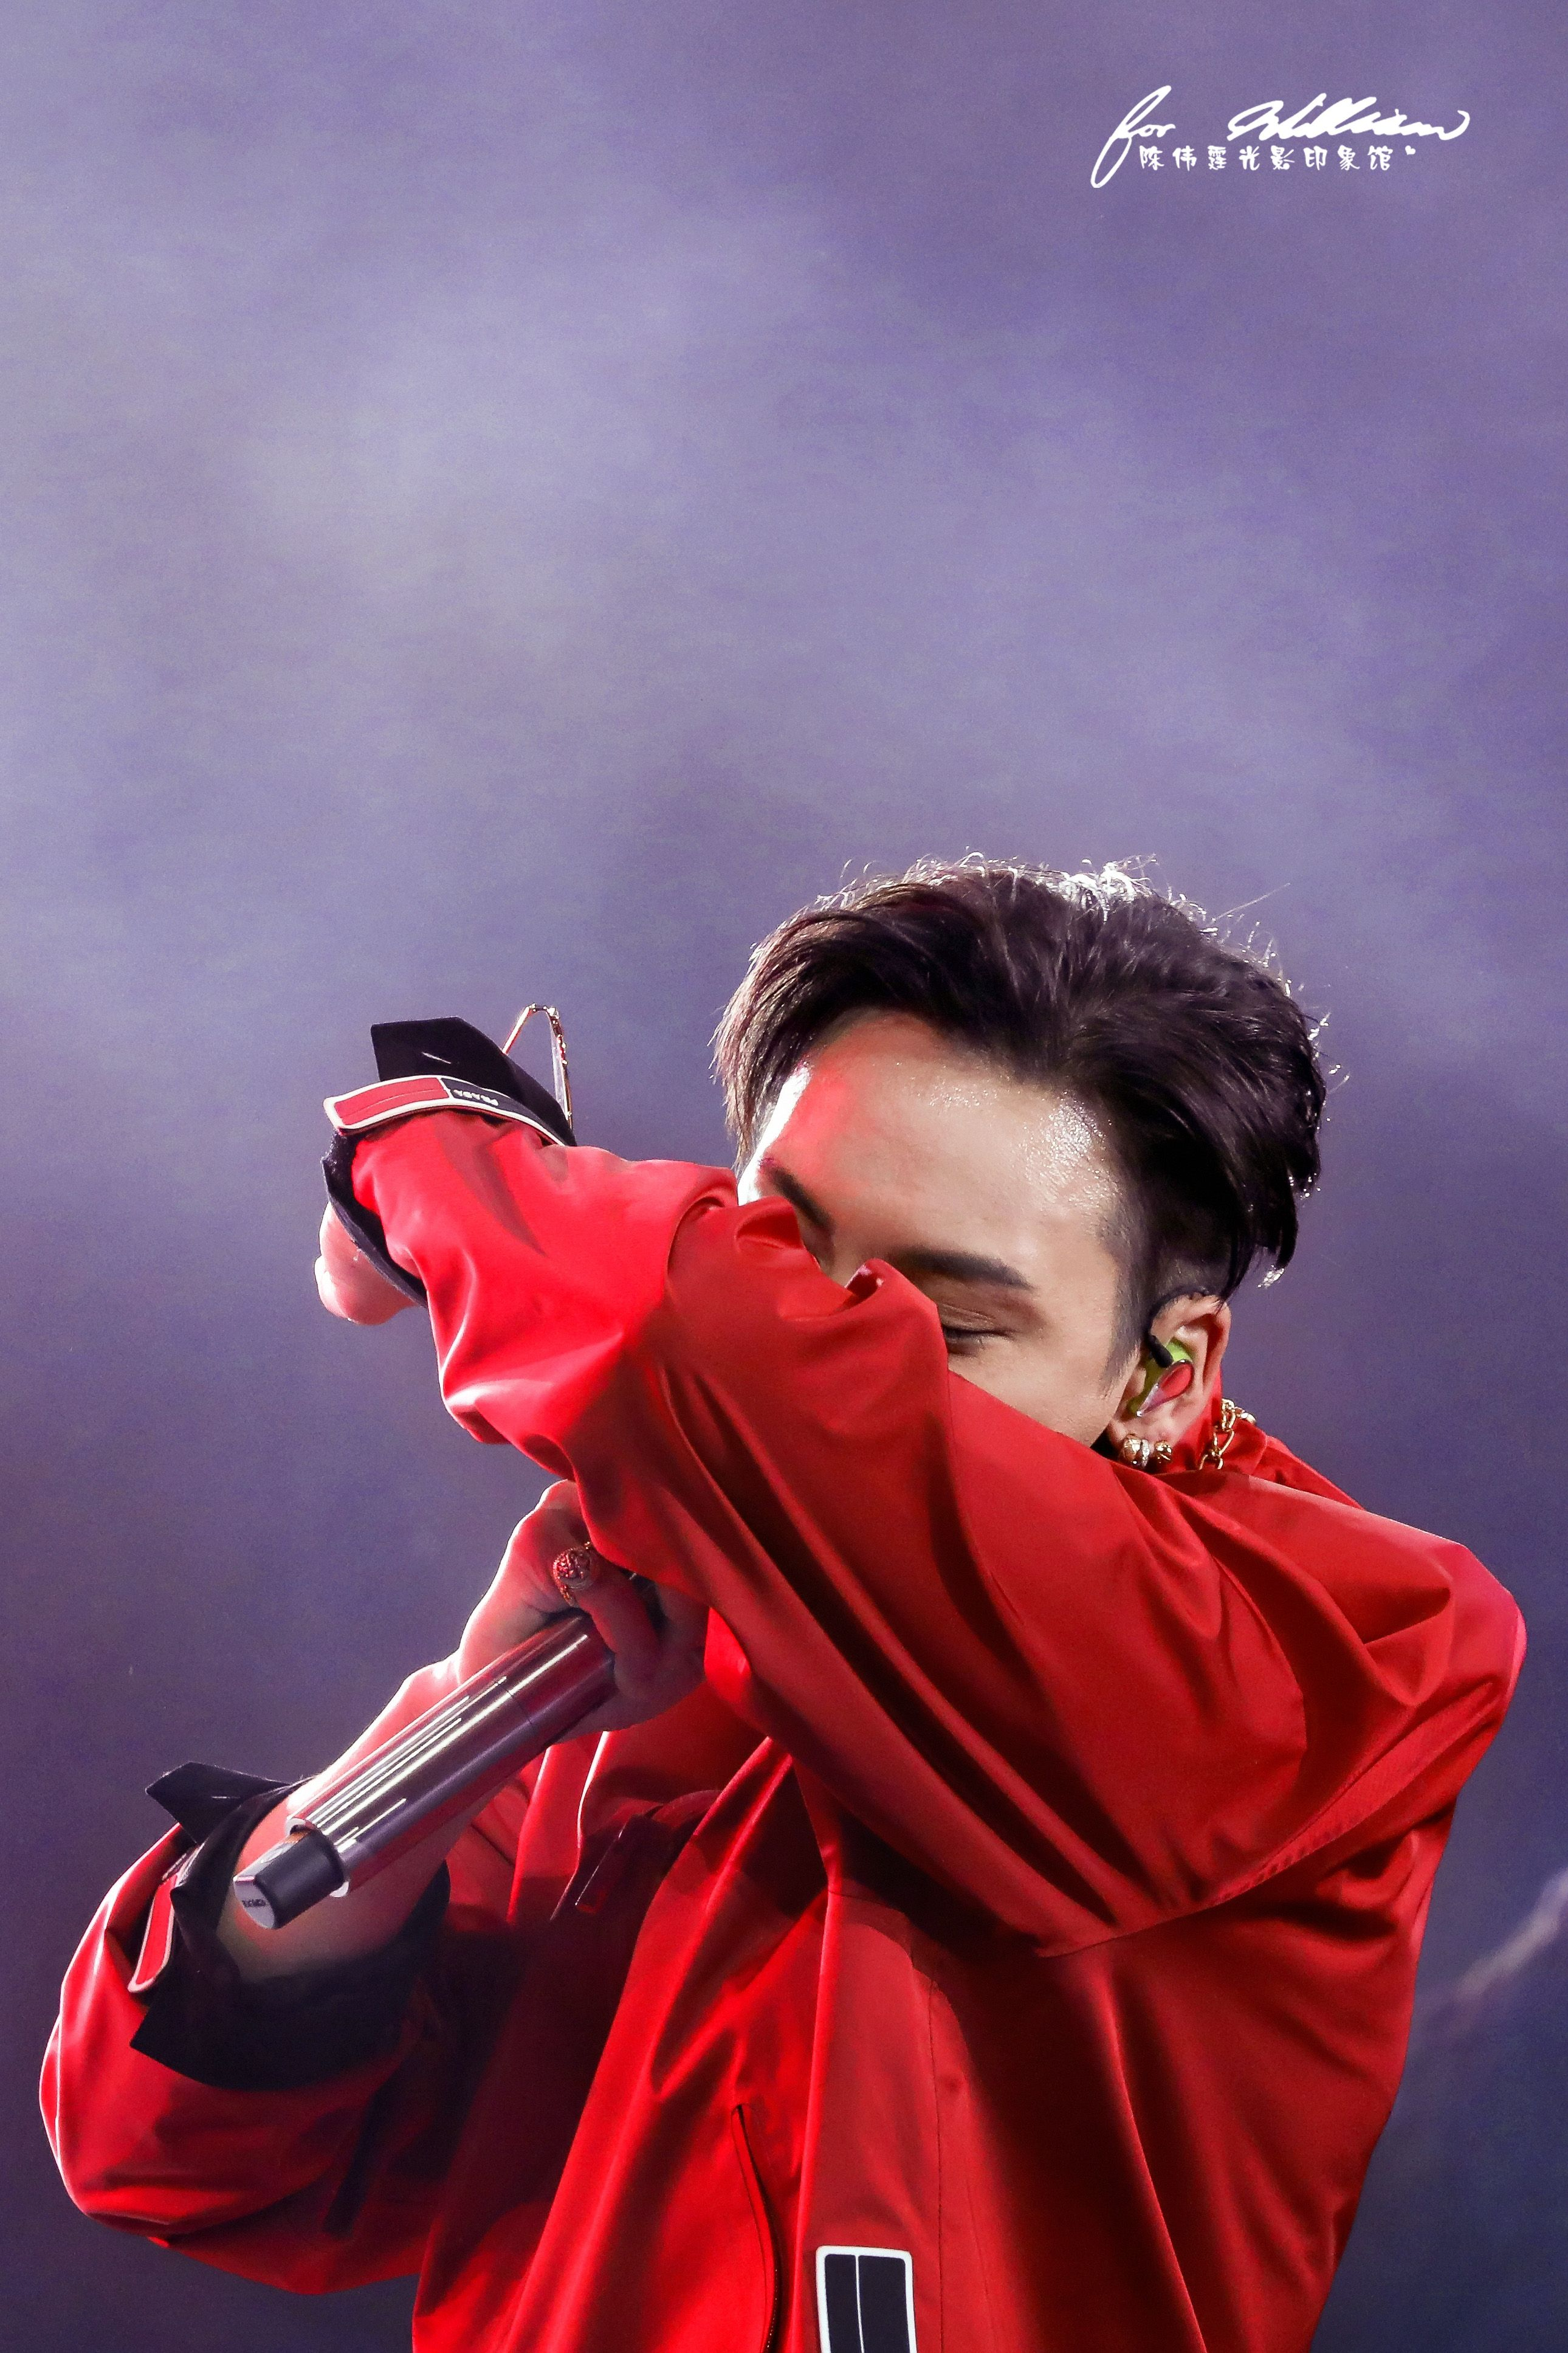 William Chan Fanpics Dragon TV New Year's Eve Show Dec